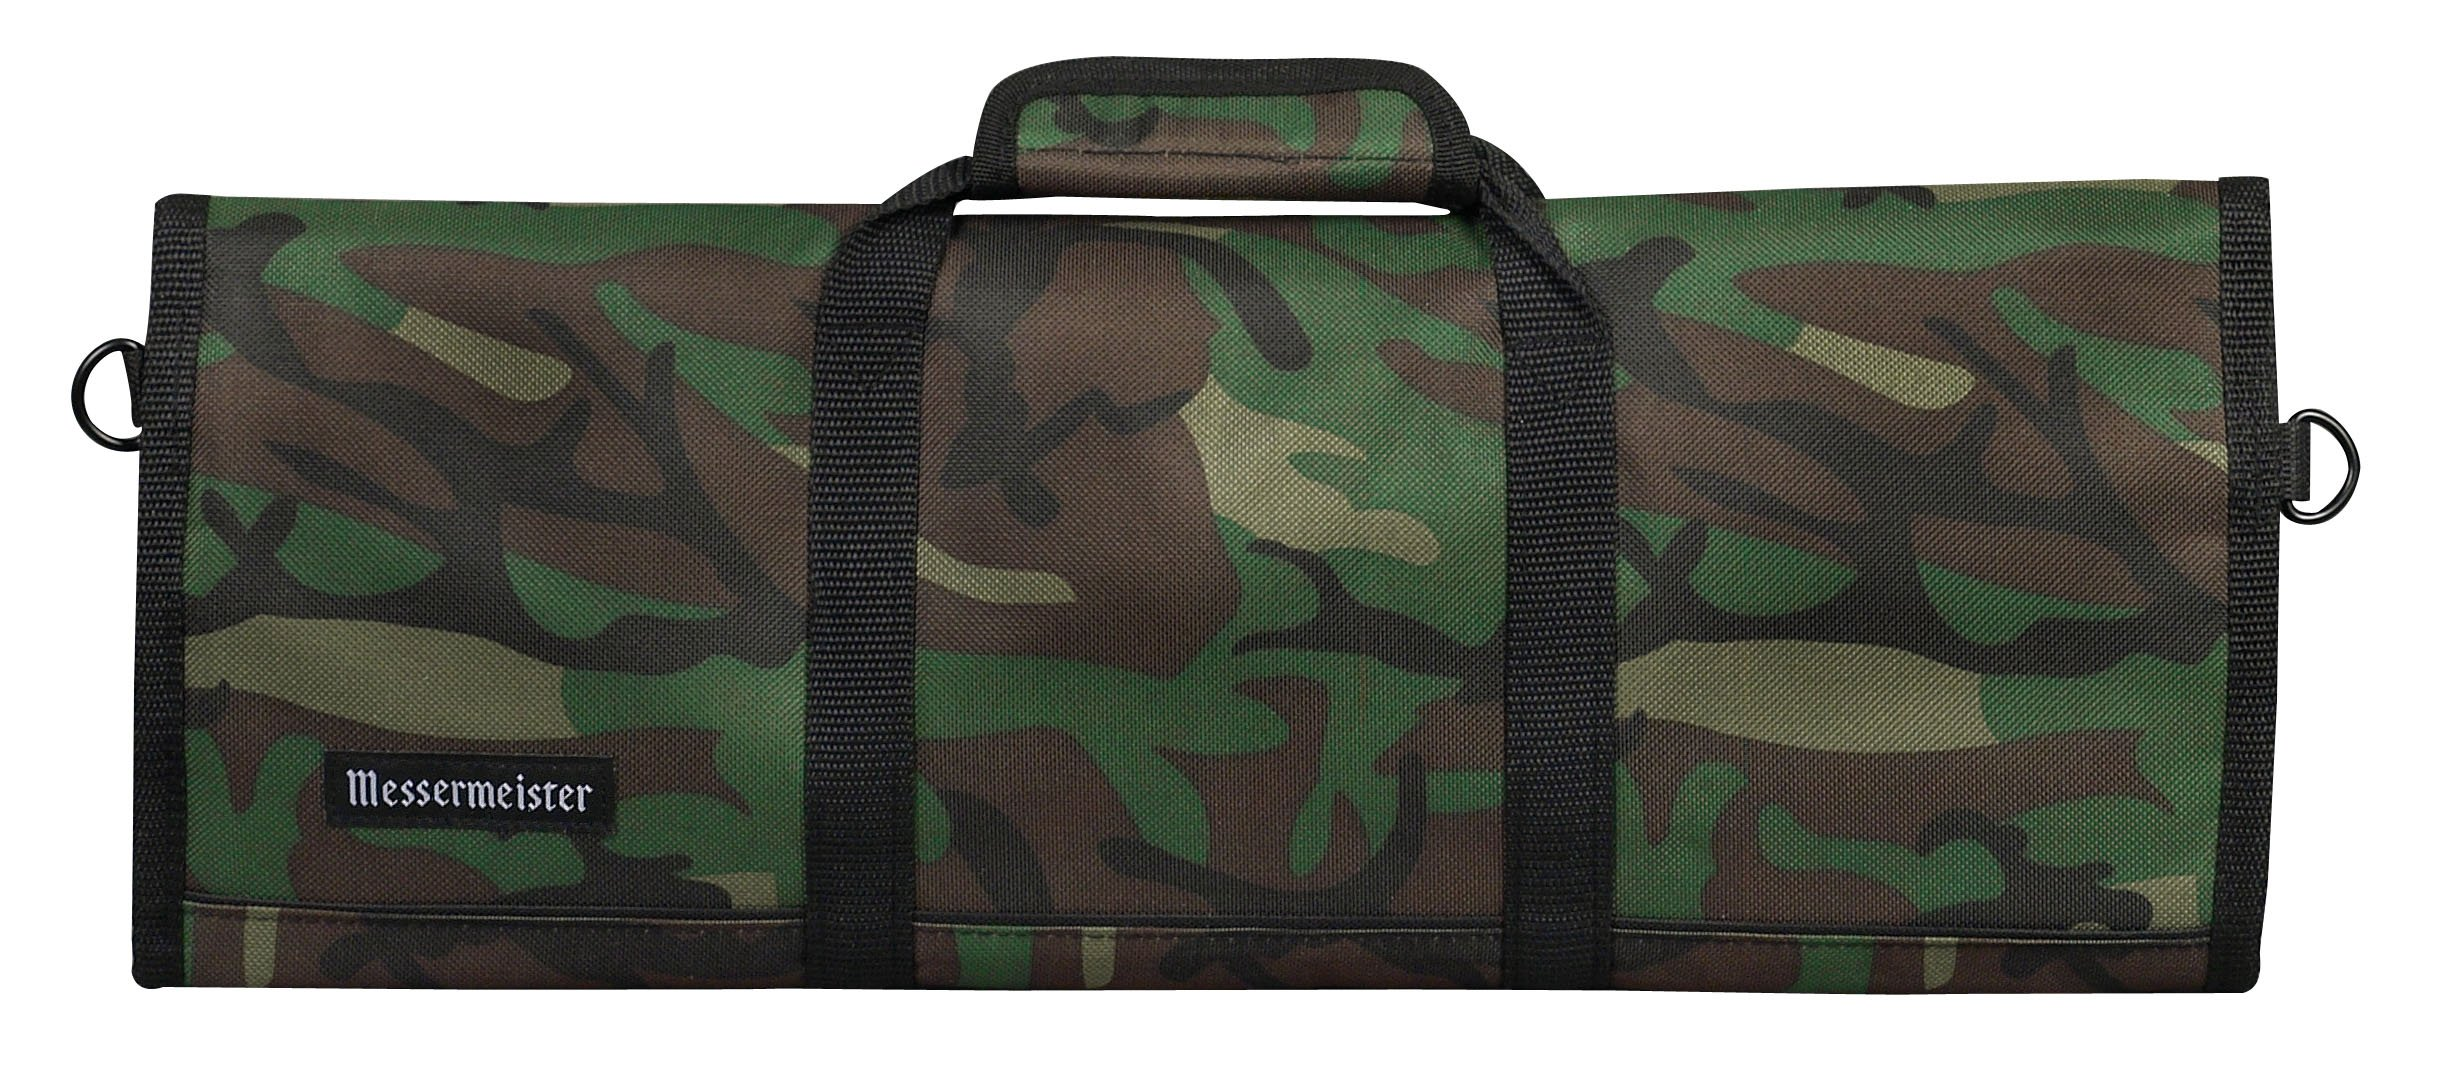 Messermeister 12-Pocket Padded Knife Roll, Camouflage